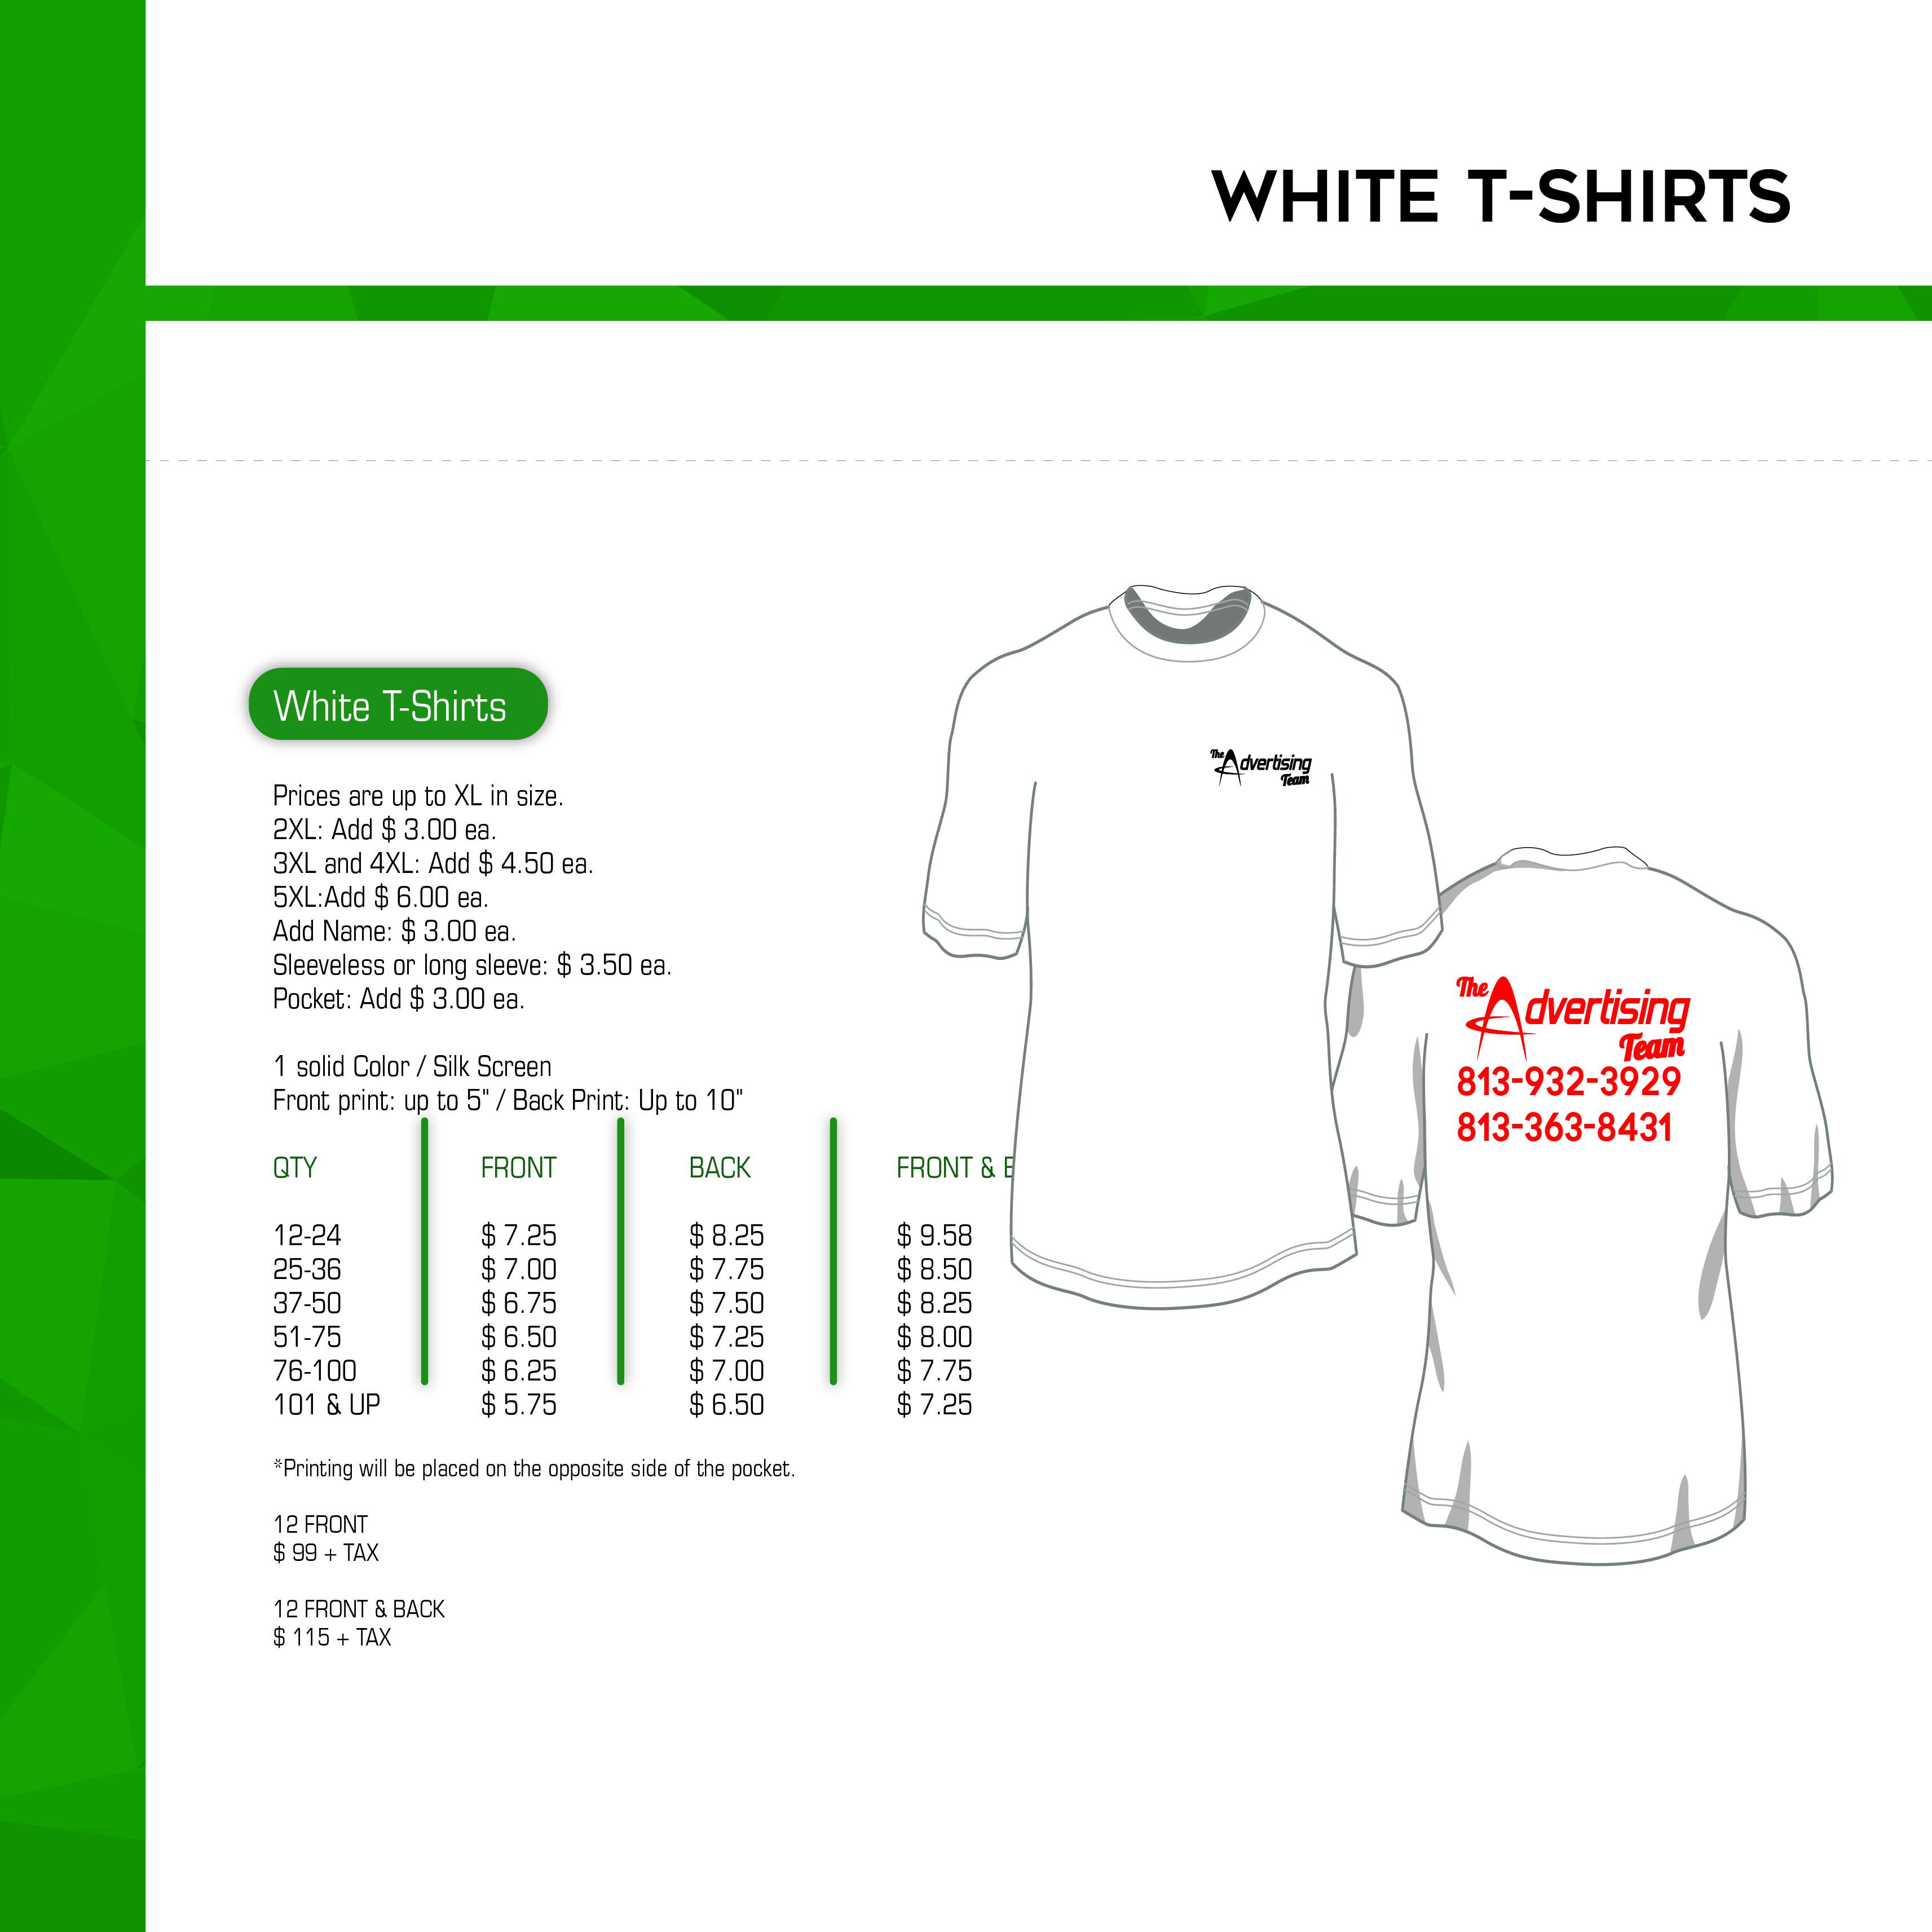 9de0f0fda Promotional T Shirts No Minimum Order – EDGE Engineering and ...